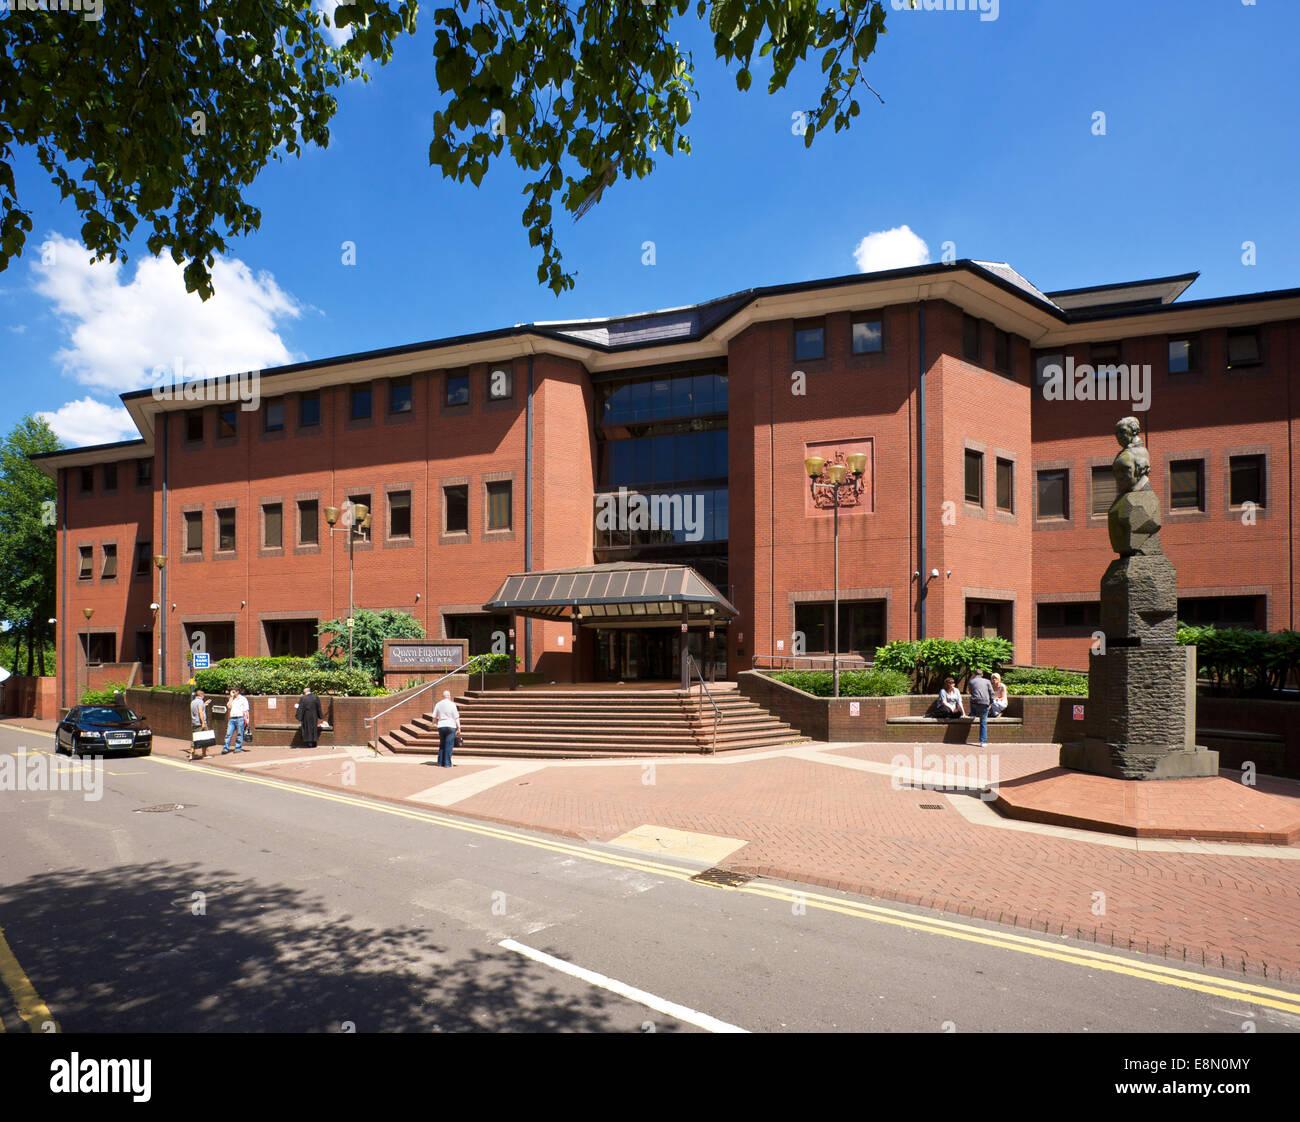 Birmingham Crown Court Birmingham West Midlands England Uk Stock Photo Alamy